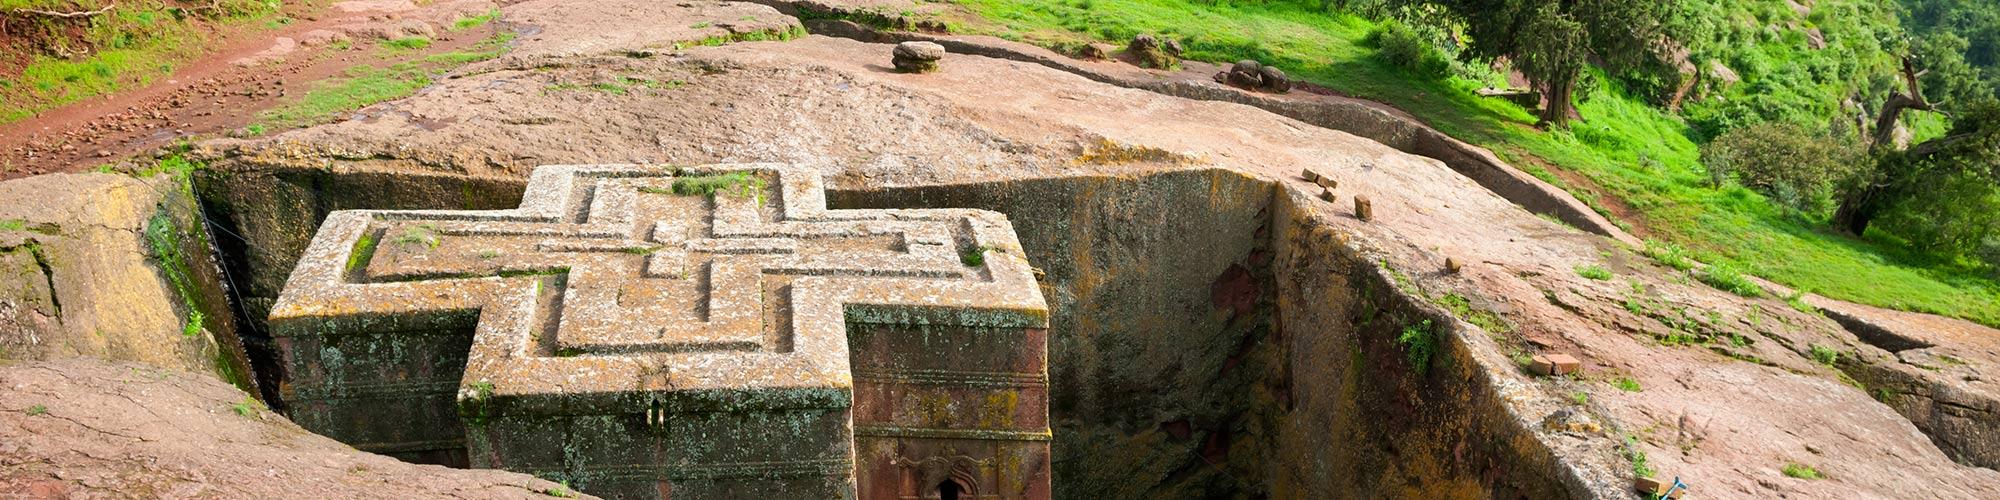 Etiopía, paraíso encontrado